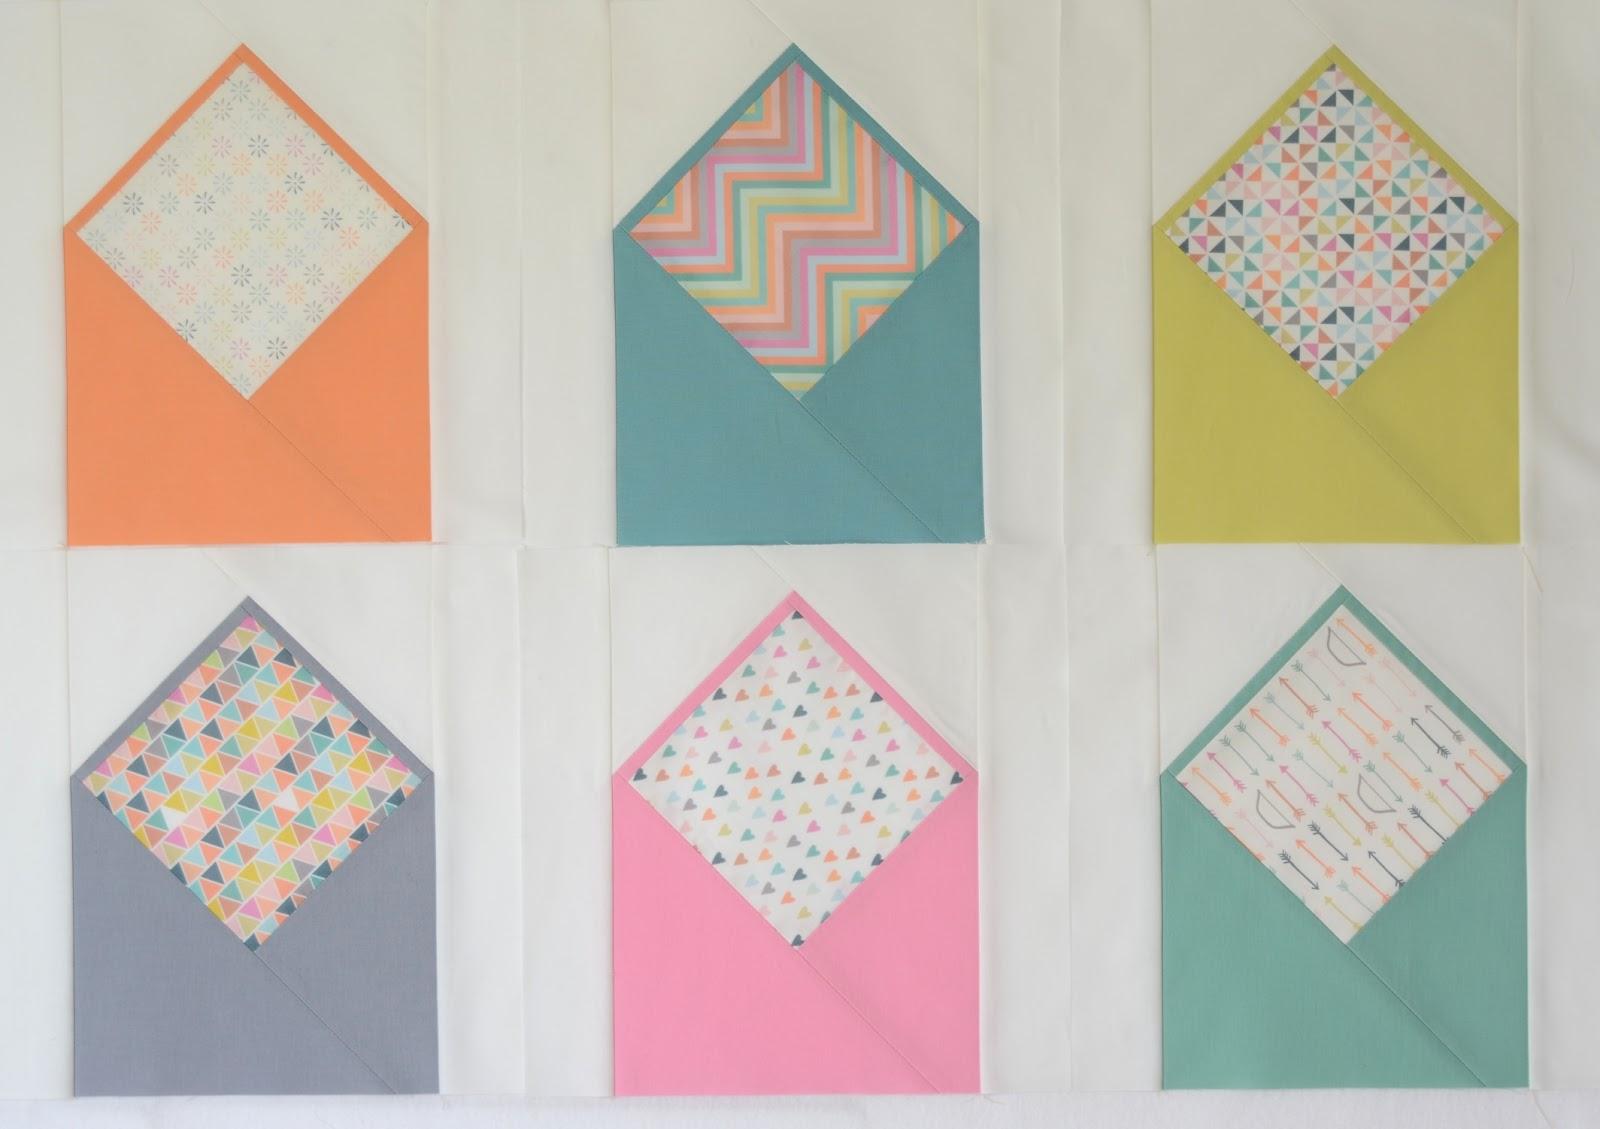 Hyacinth Quilt Designs: WIP Envelope Block : hyacinth quilt designs - Adamdwight.com